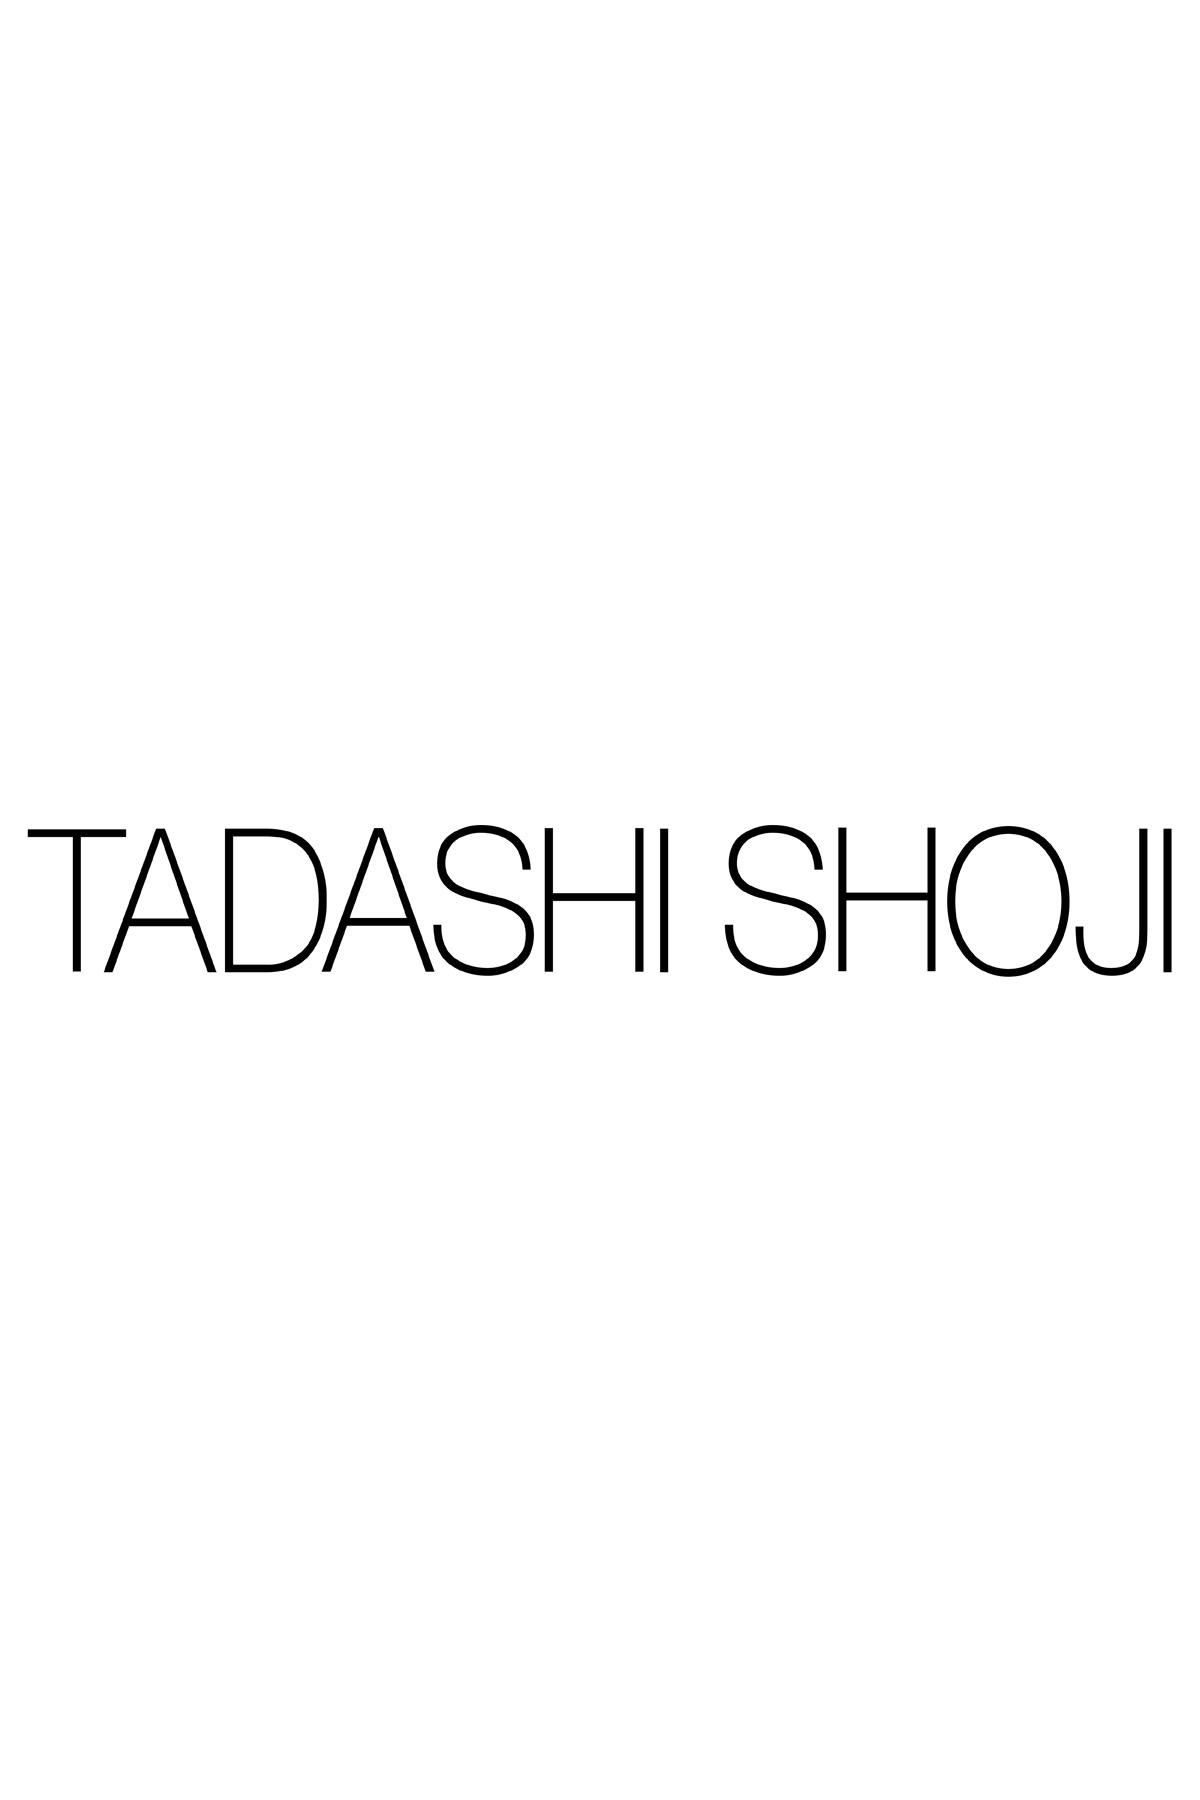 Tadashi Shoji Fragrance - Eau De Rose Gift Set